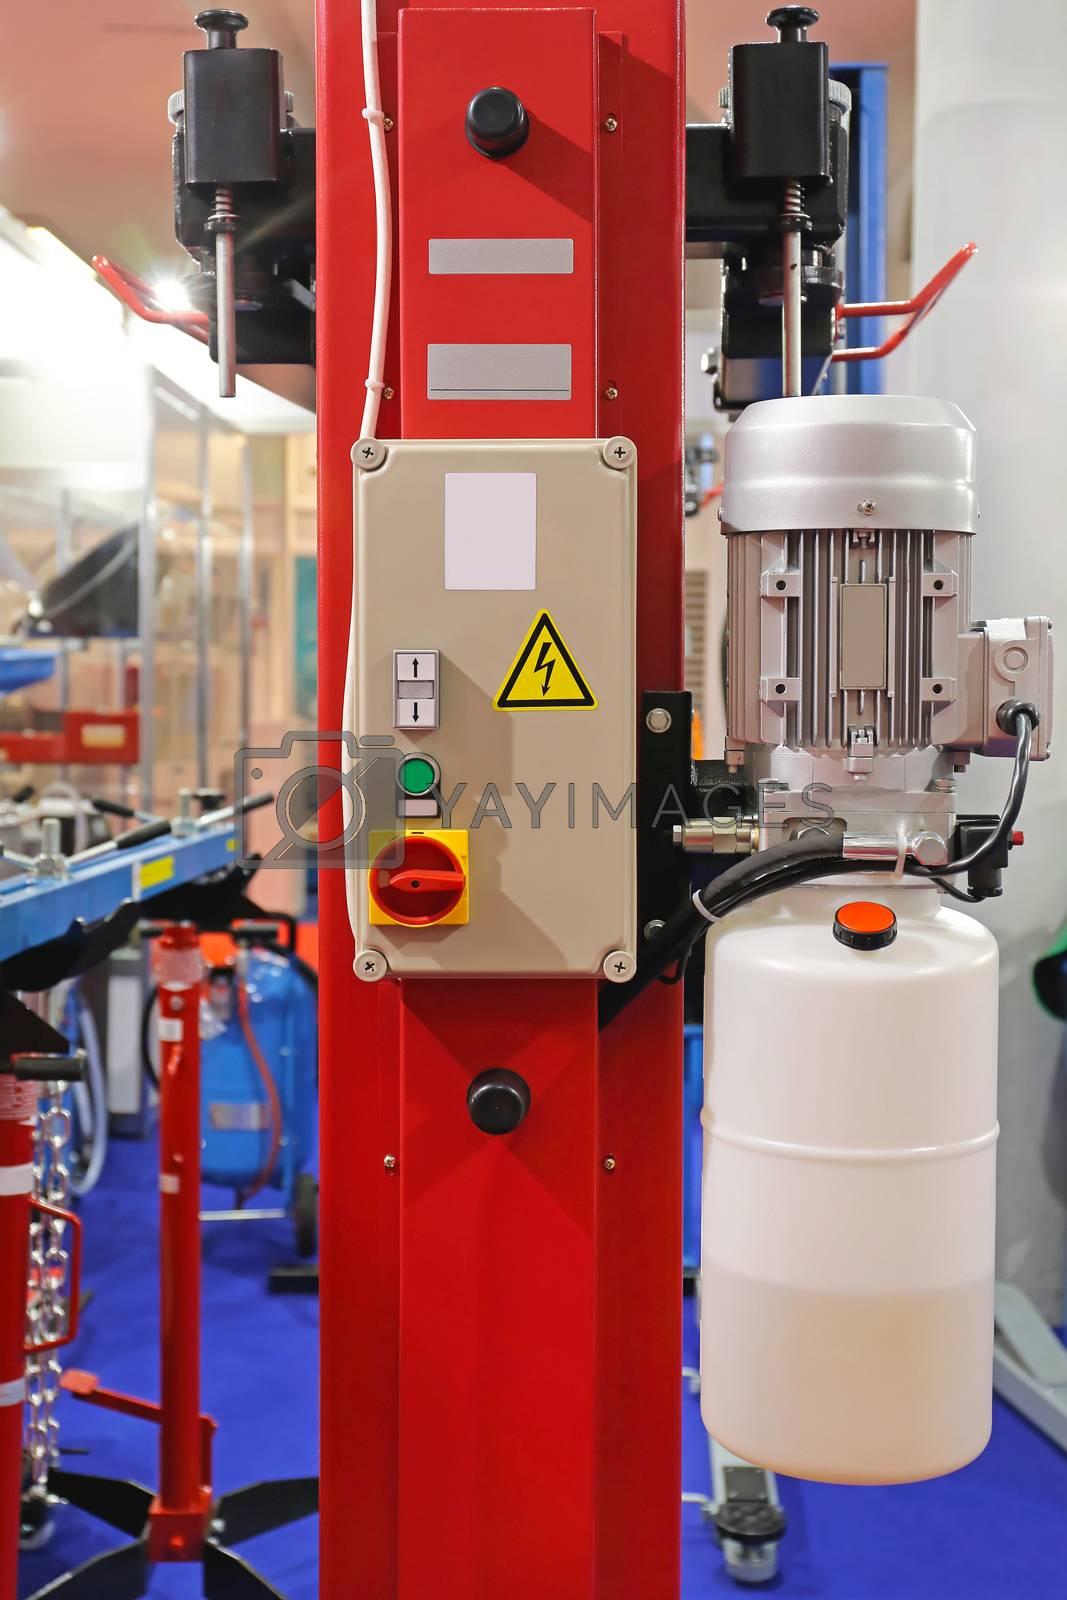 Car Lift Equipment in Service Garage